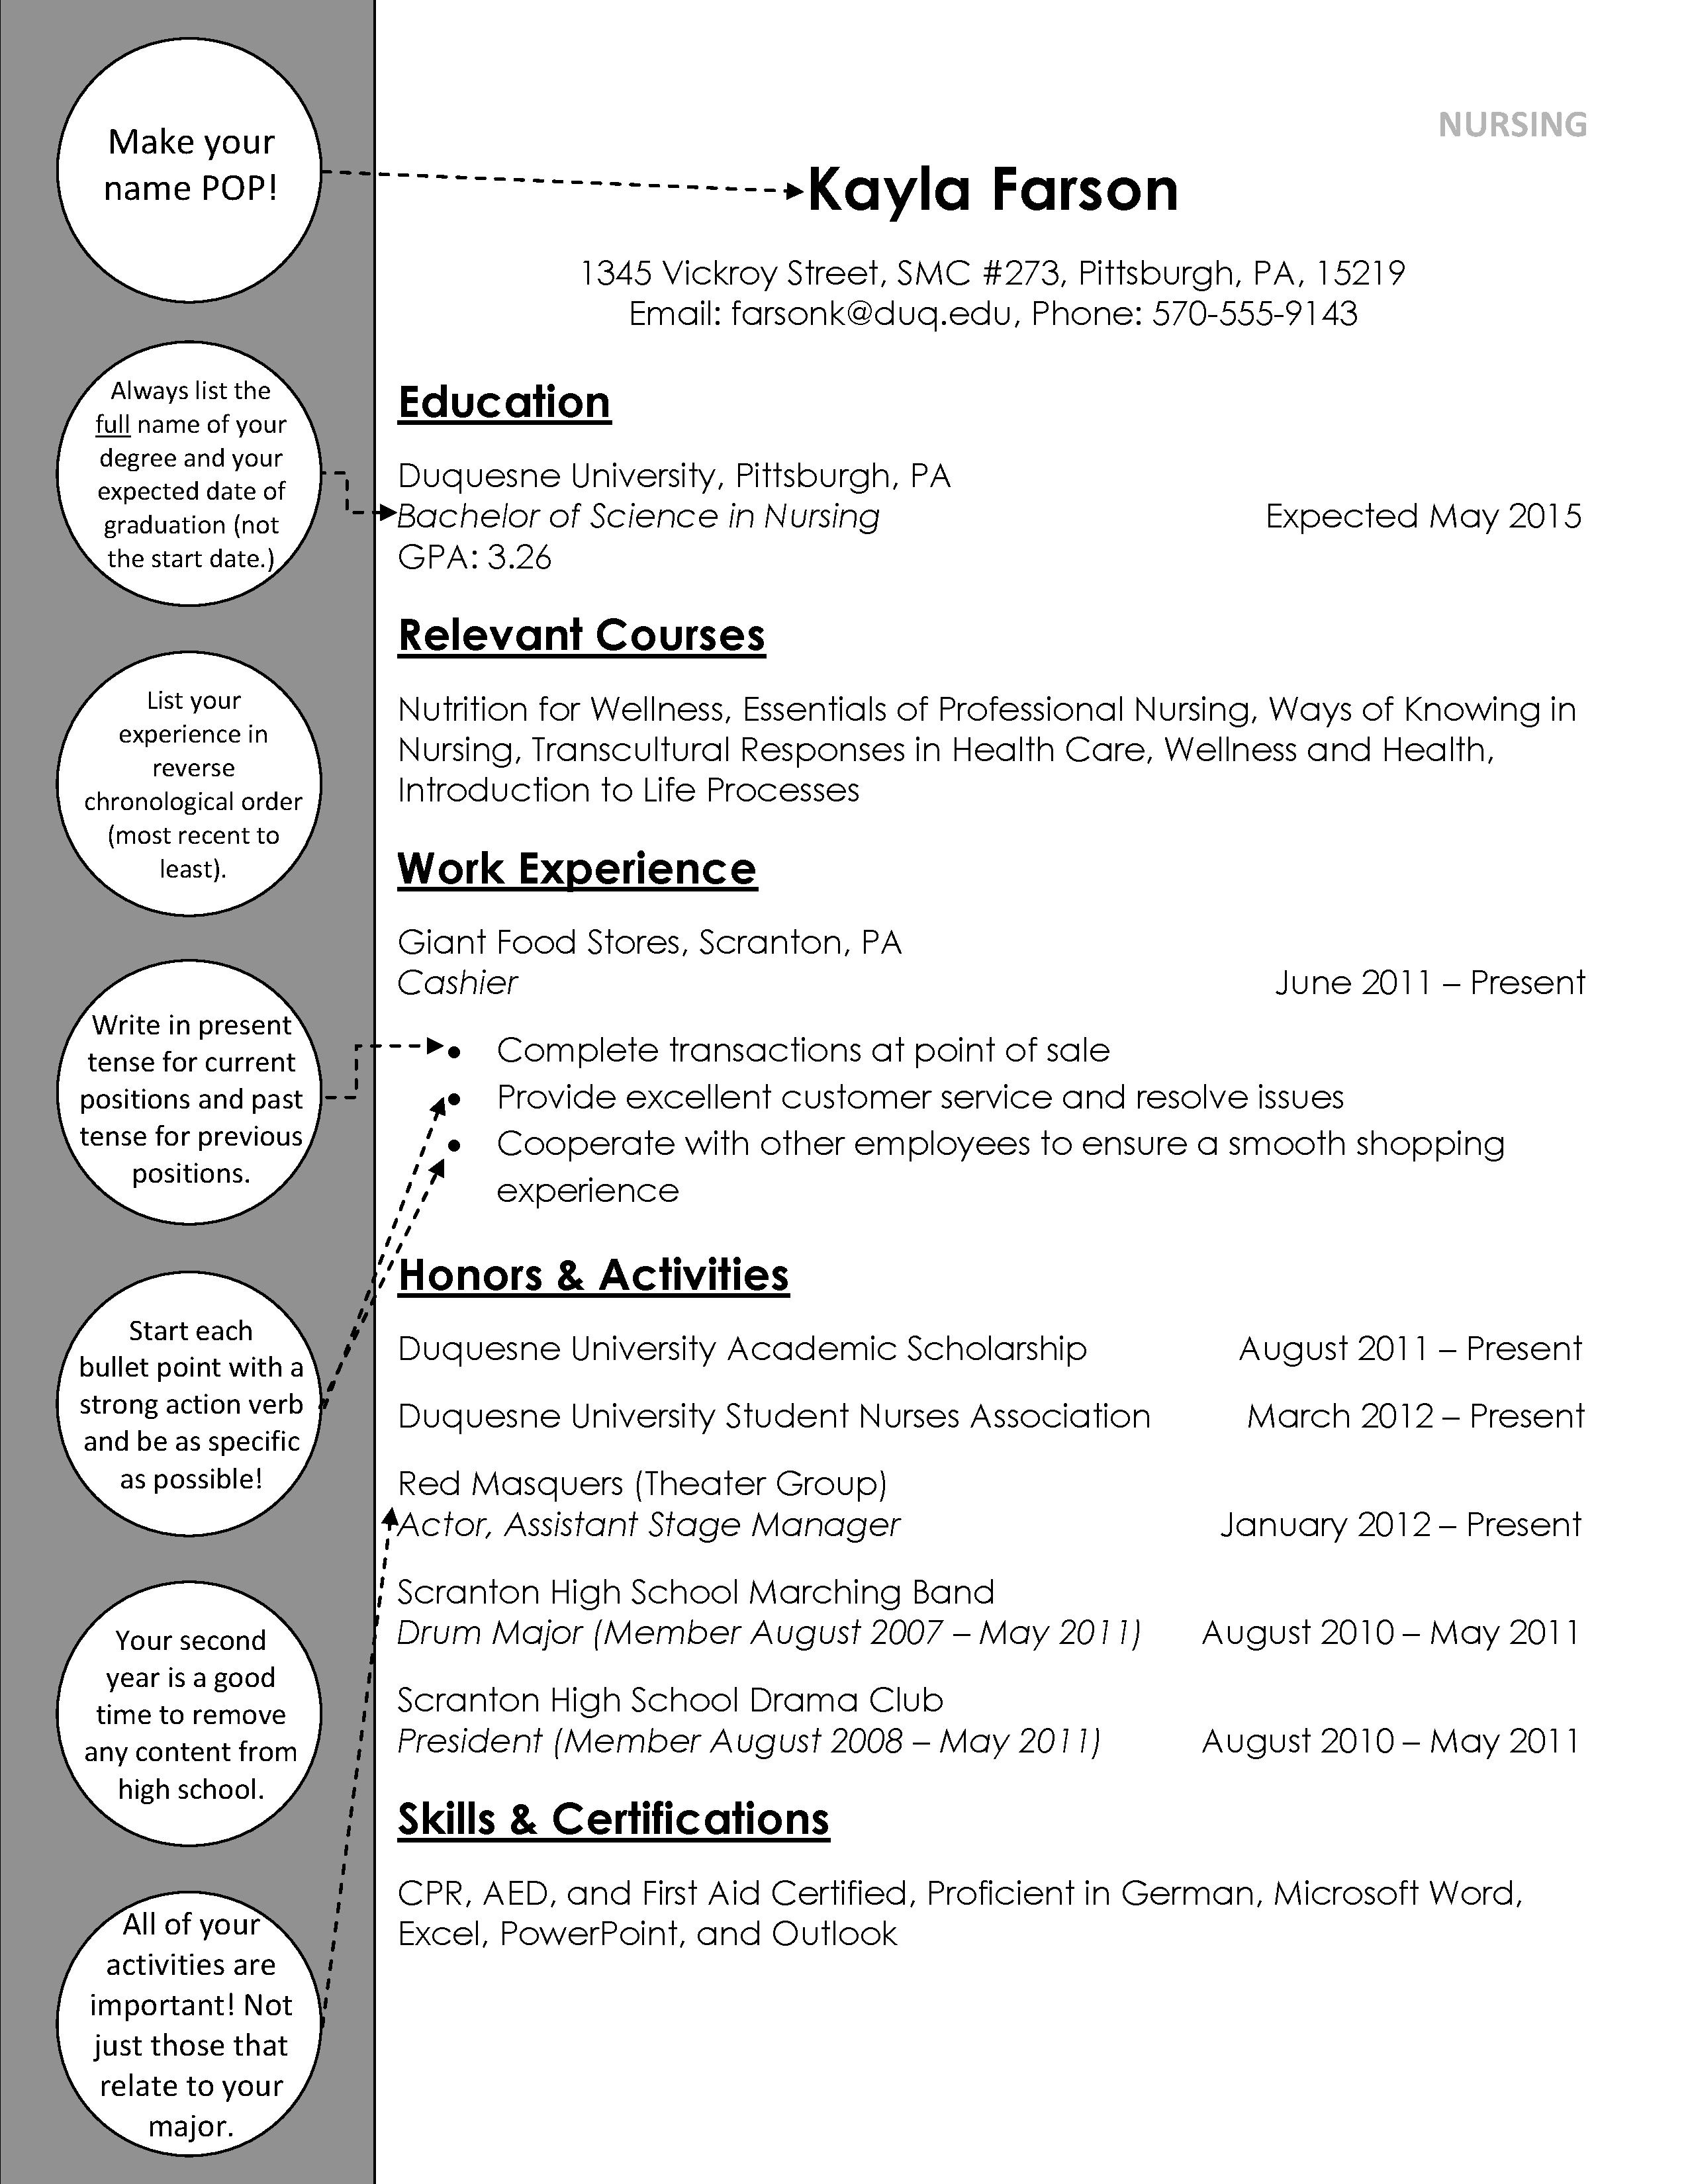 Professional Skills For Resume Nursing